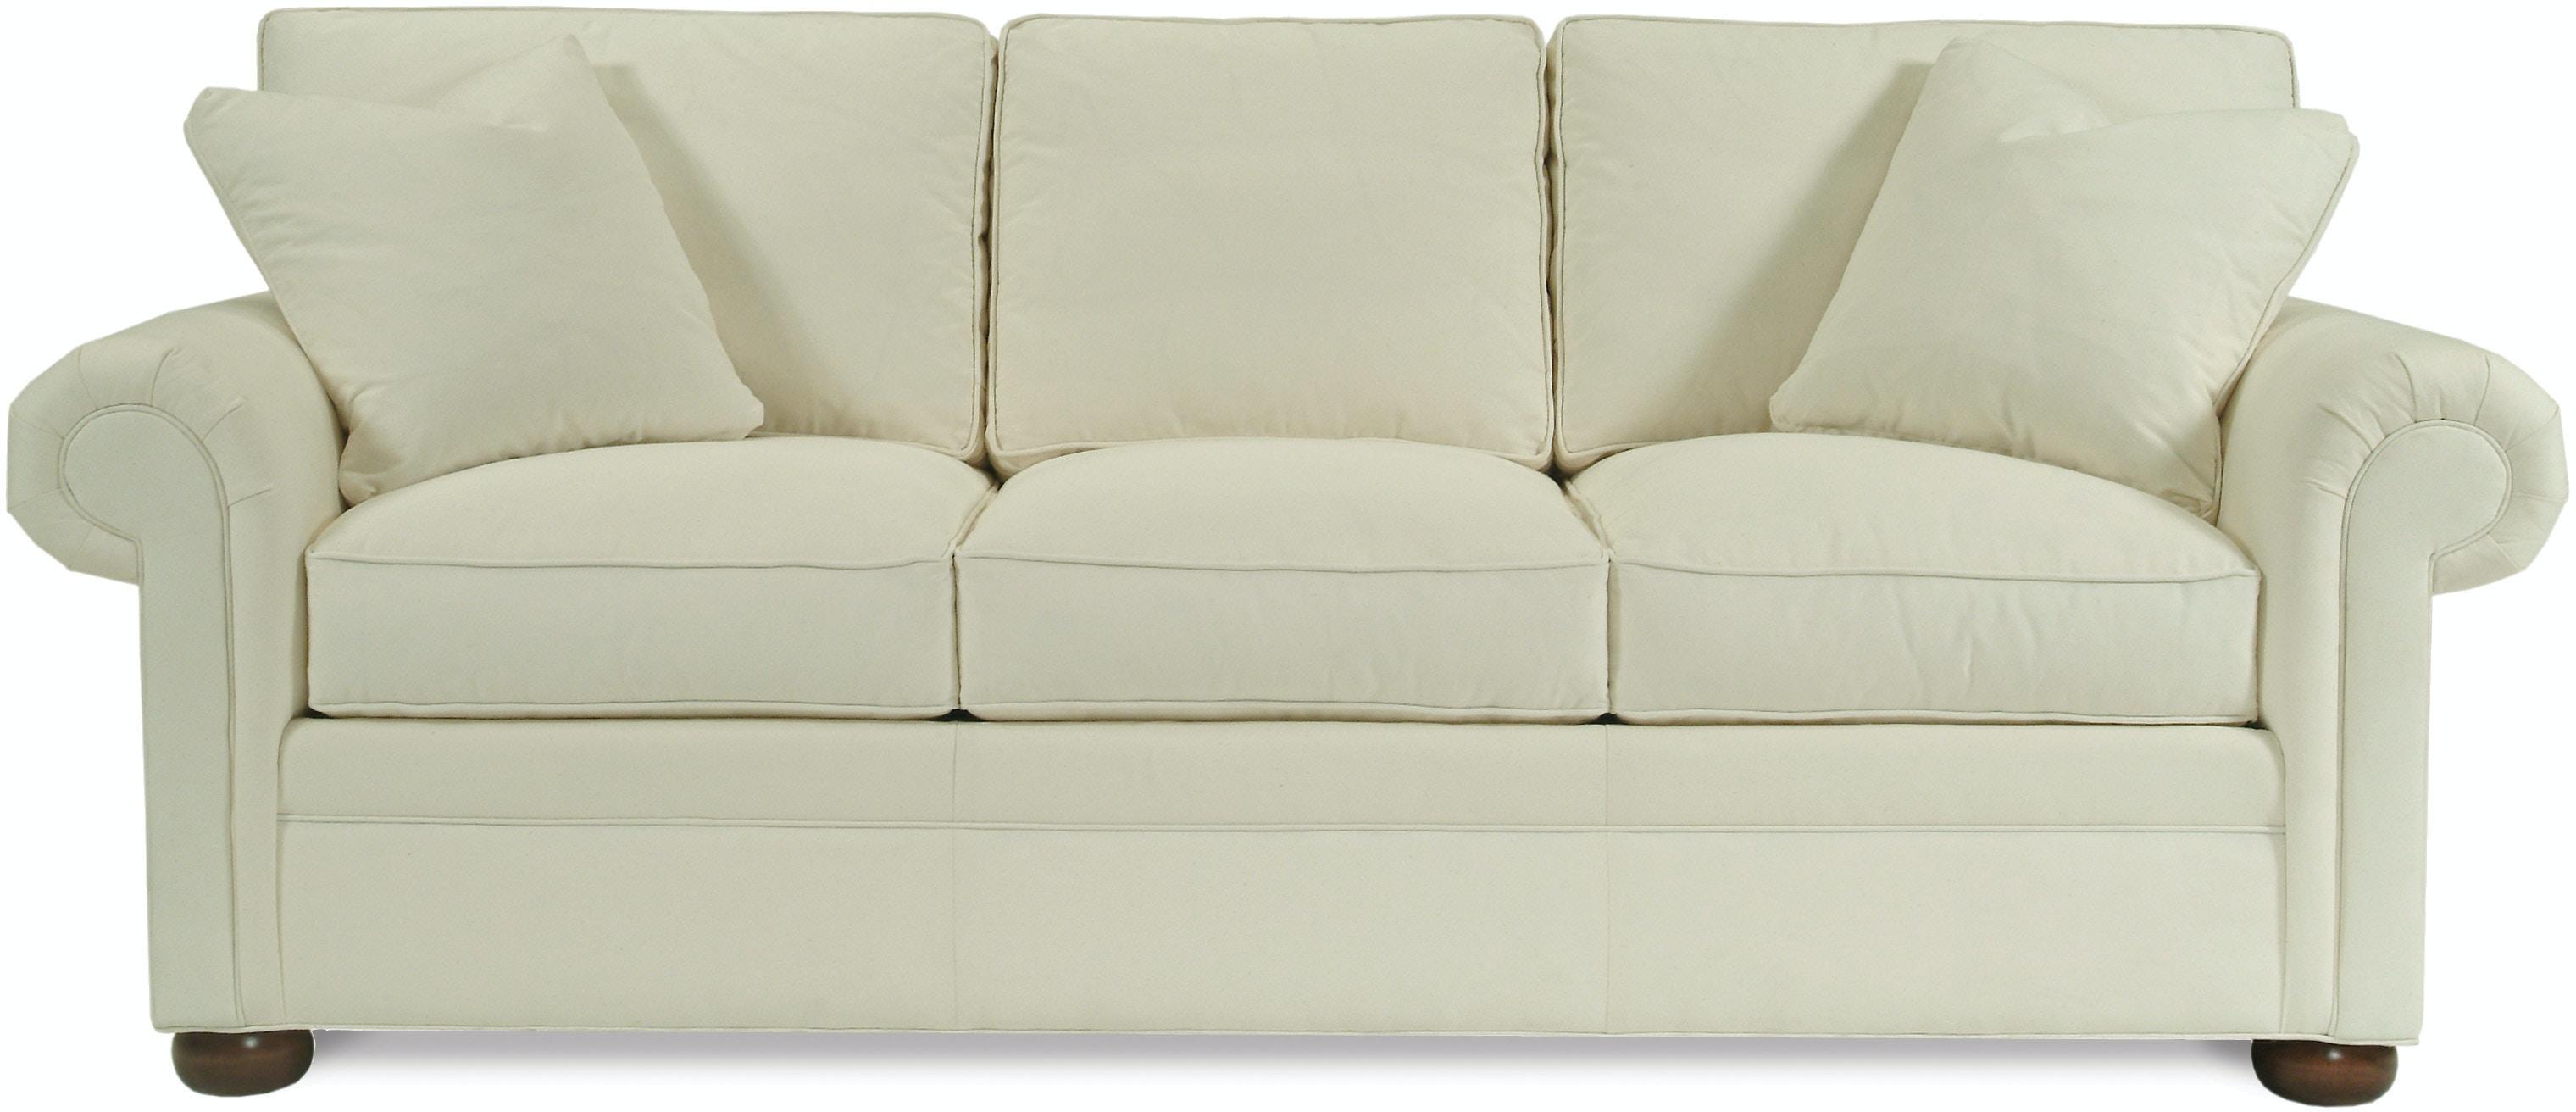 Vanguard Furniture Living Room Main Street Sofa 601 S